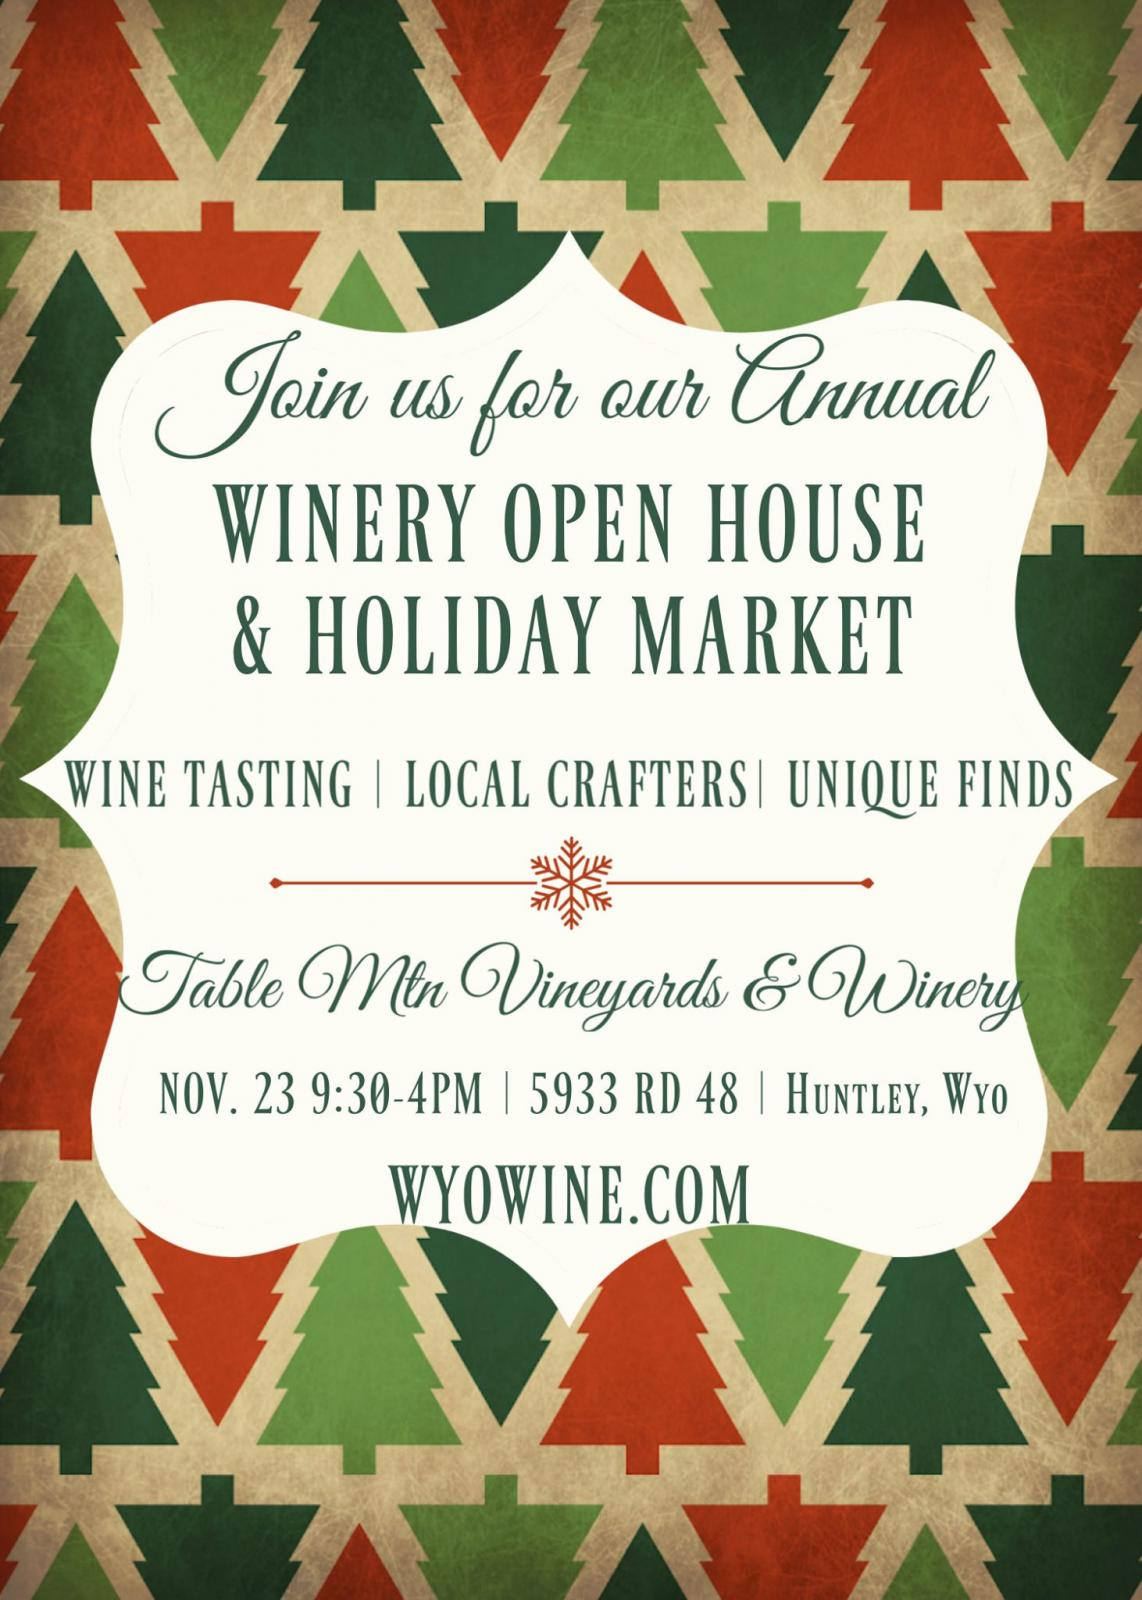 Winery Open House & Holiday Market Photo